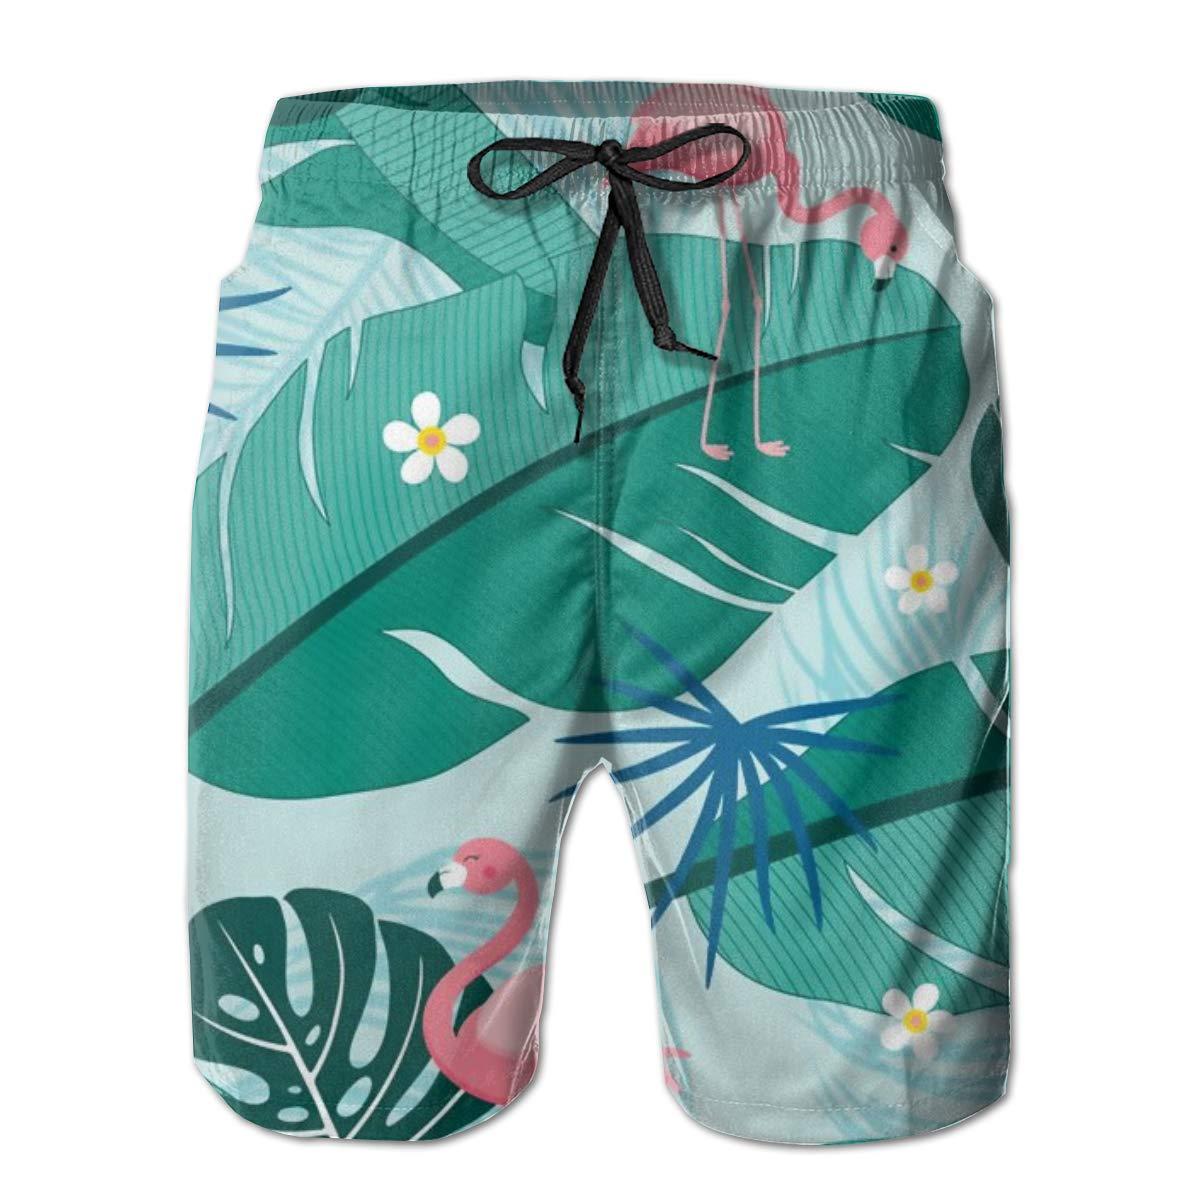 SARA NELL Mens Swim Trunks Pattern Tropical Summer Design Surfing Beach Board Shorts Swimwear